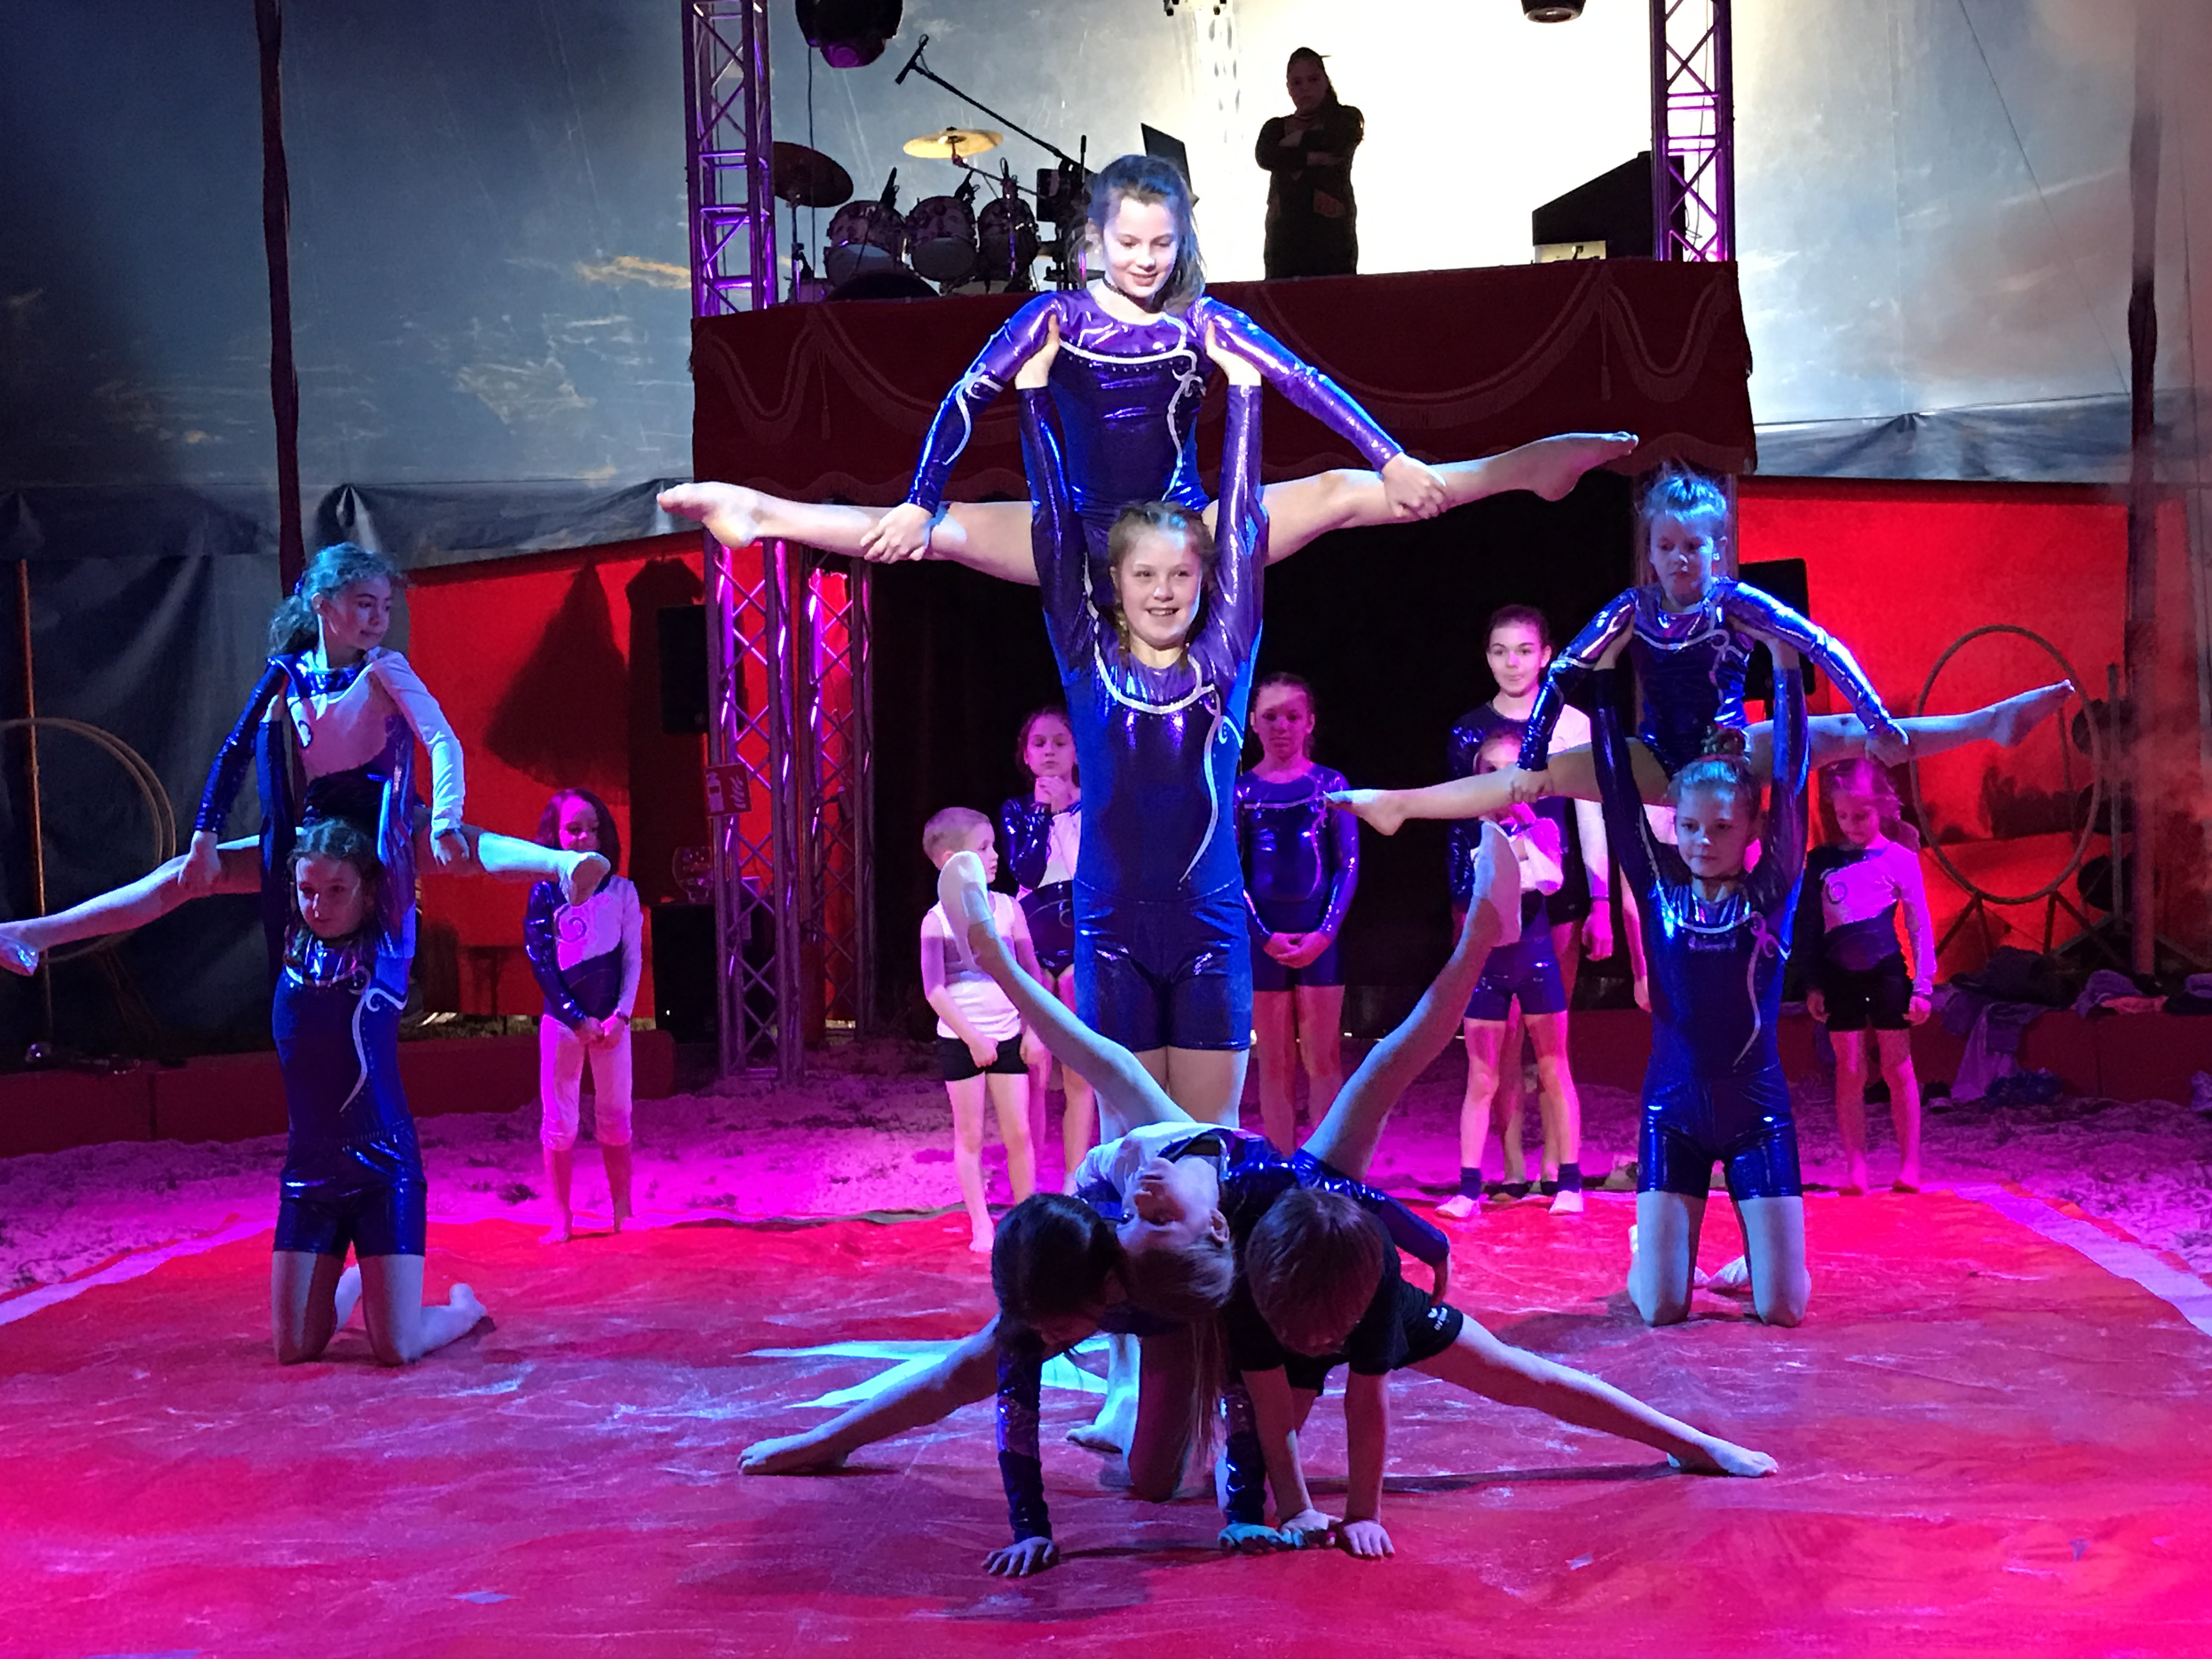 Maxglaner Nachwuchsakrobaten Im Zirkus